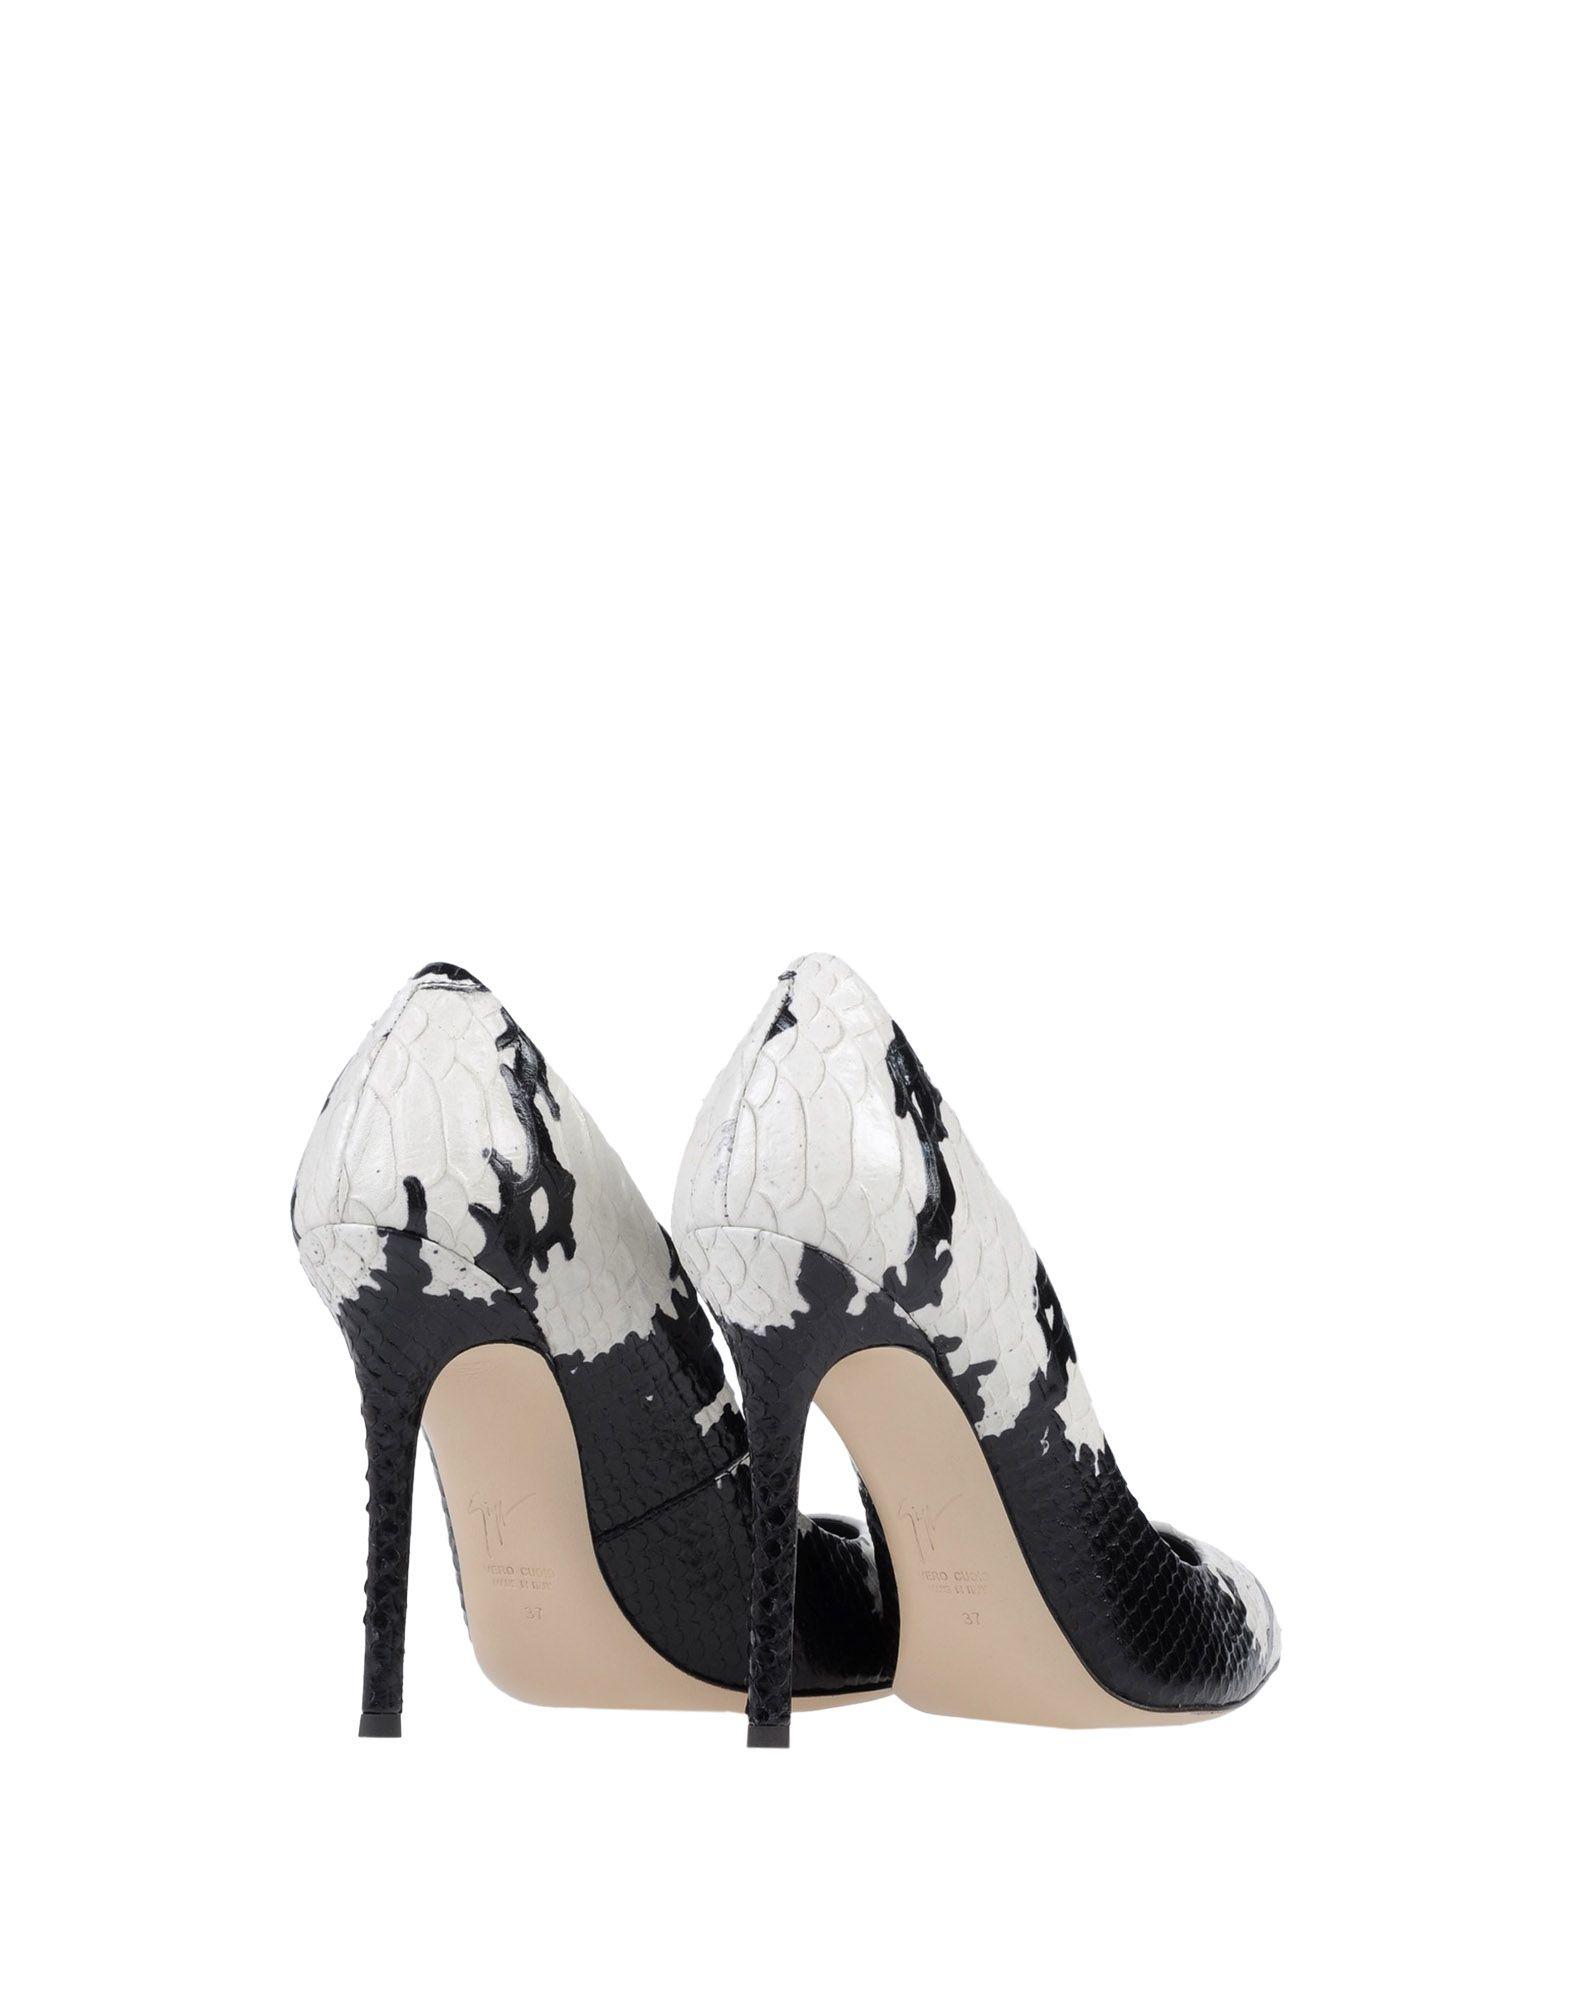 Giuseppe Zanotti Pumps Damen   Damen 11394152JW Beliebte Schuhe 085033